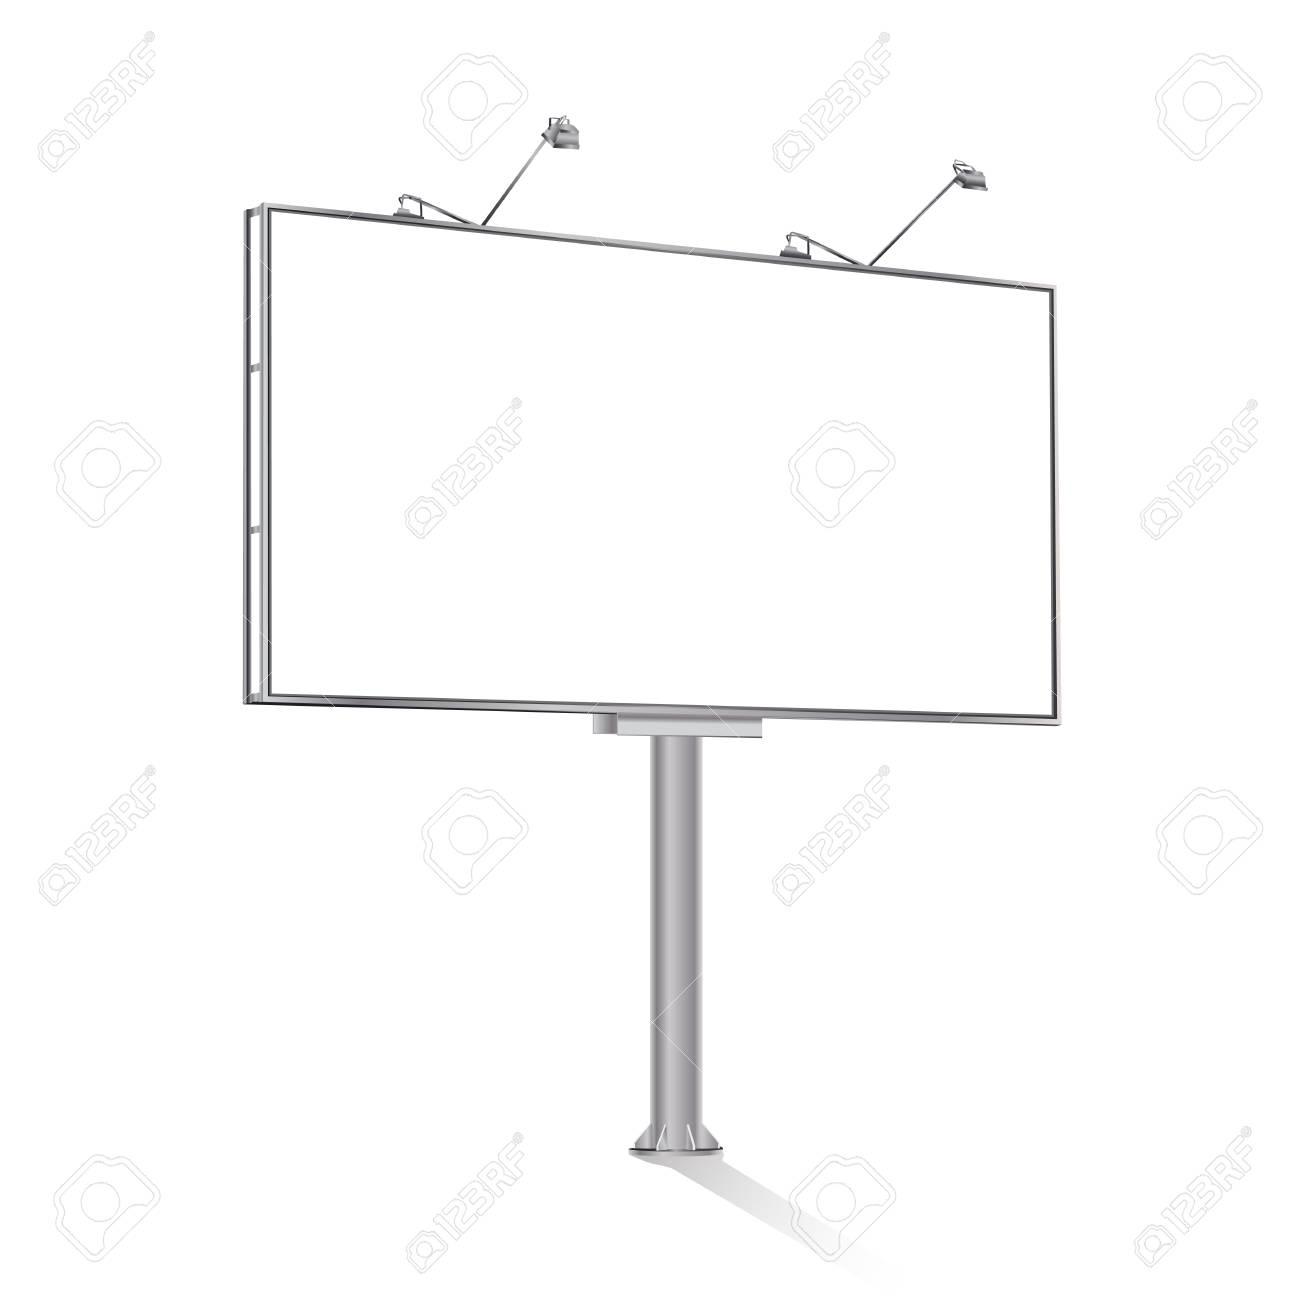 billboard on white - 37553393